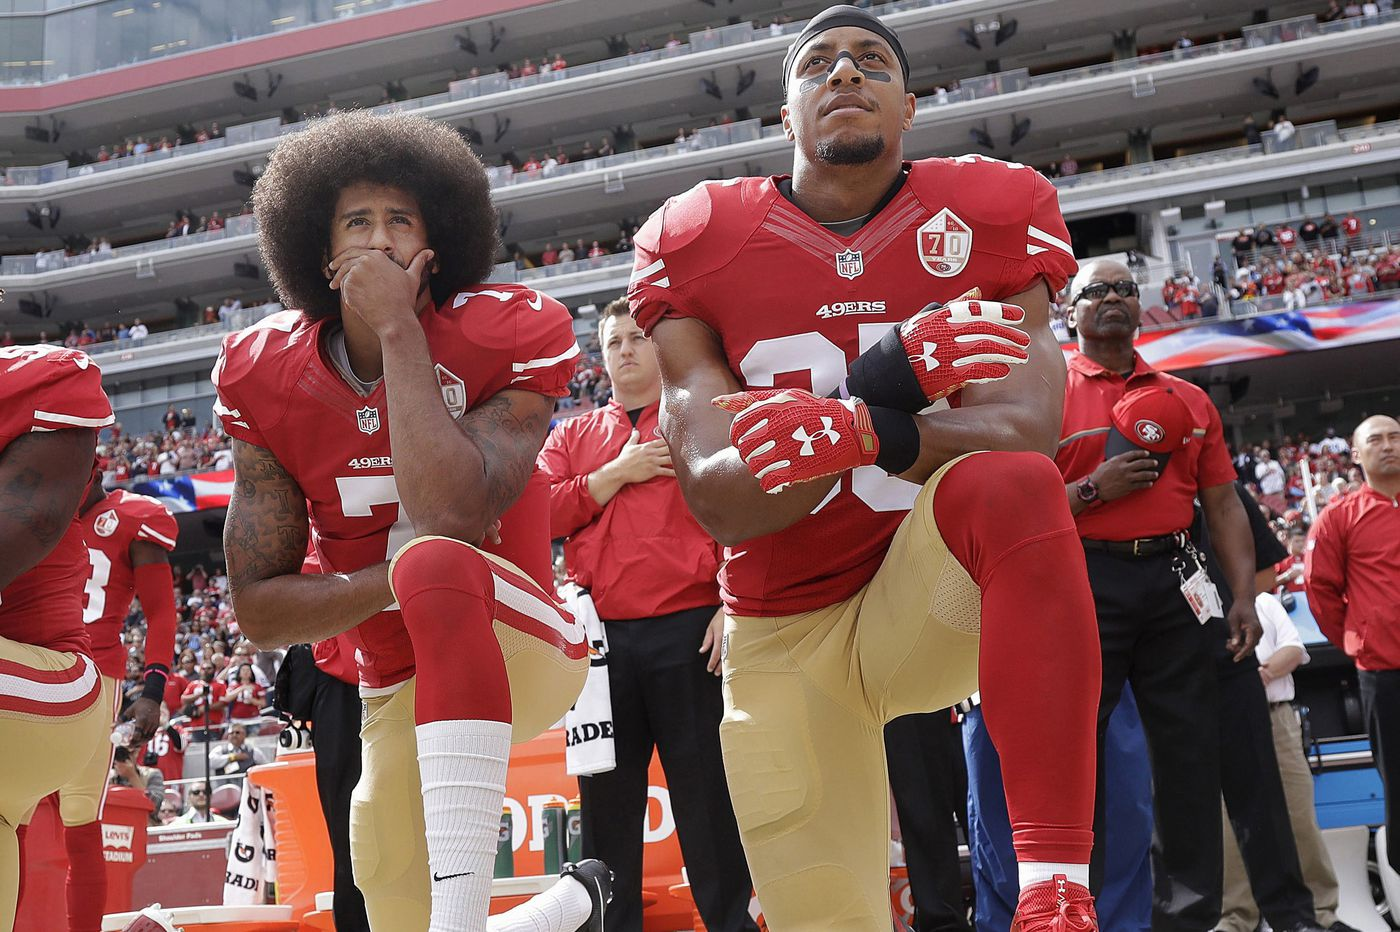 On Colin Kaepernick, burning Nikes, and the nature of the debate | David Murphy